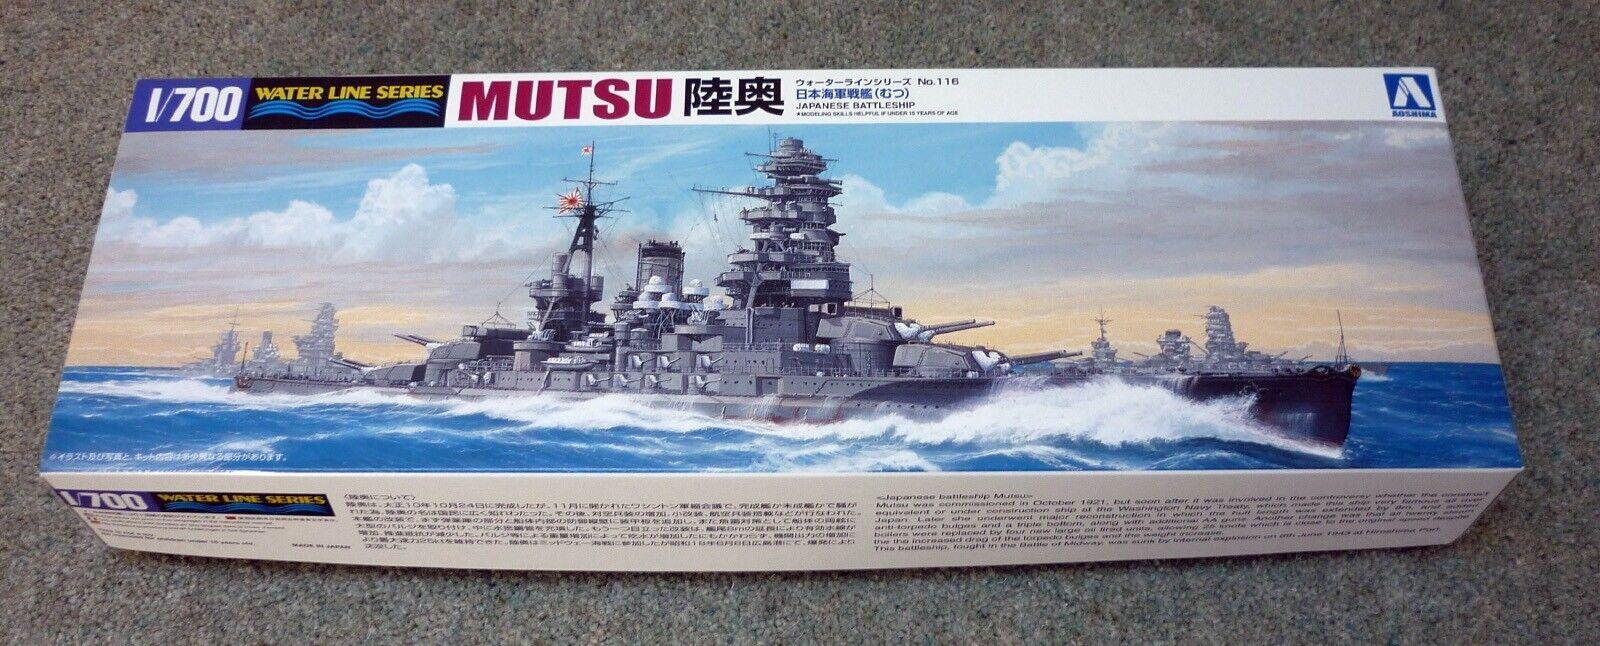 Aoshima 1 700 waterline MUTSU (WW2 Battleship) kit